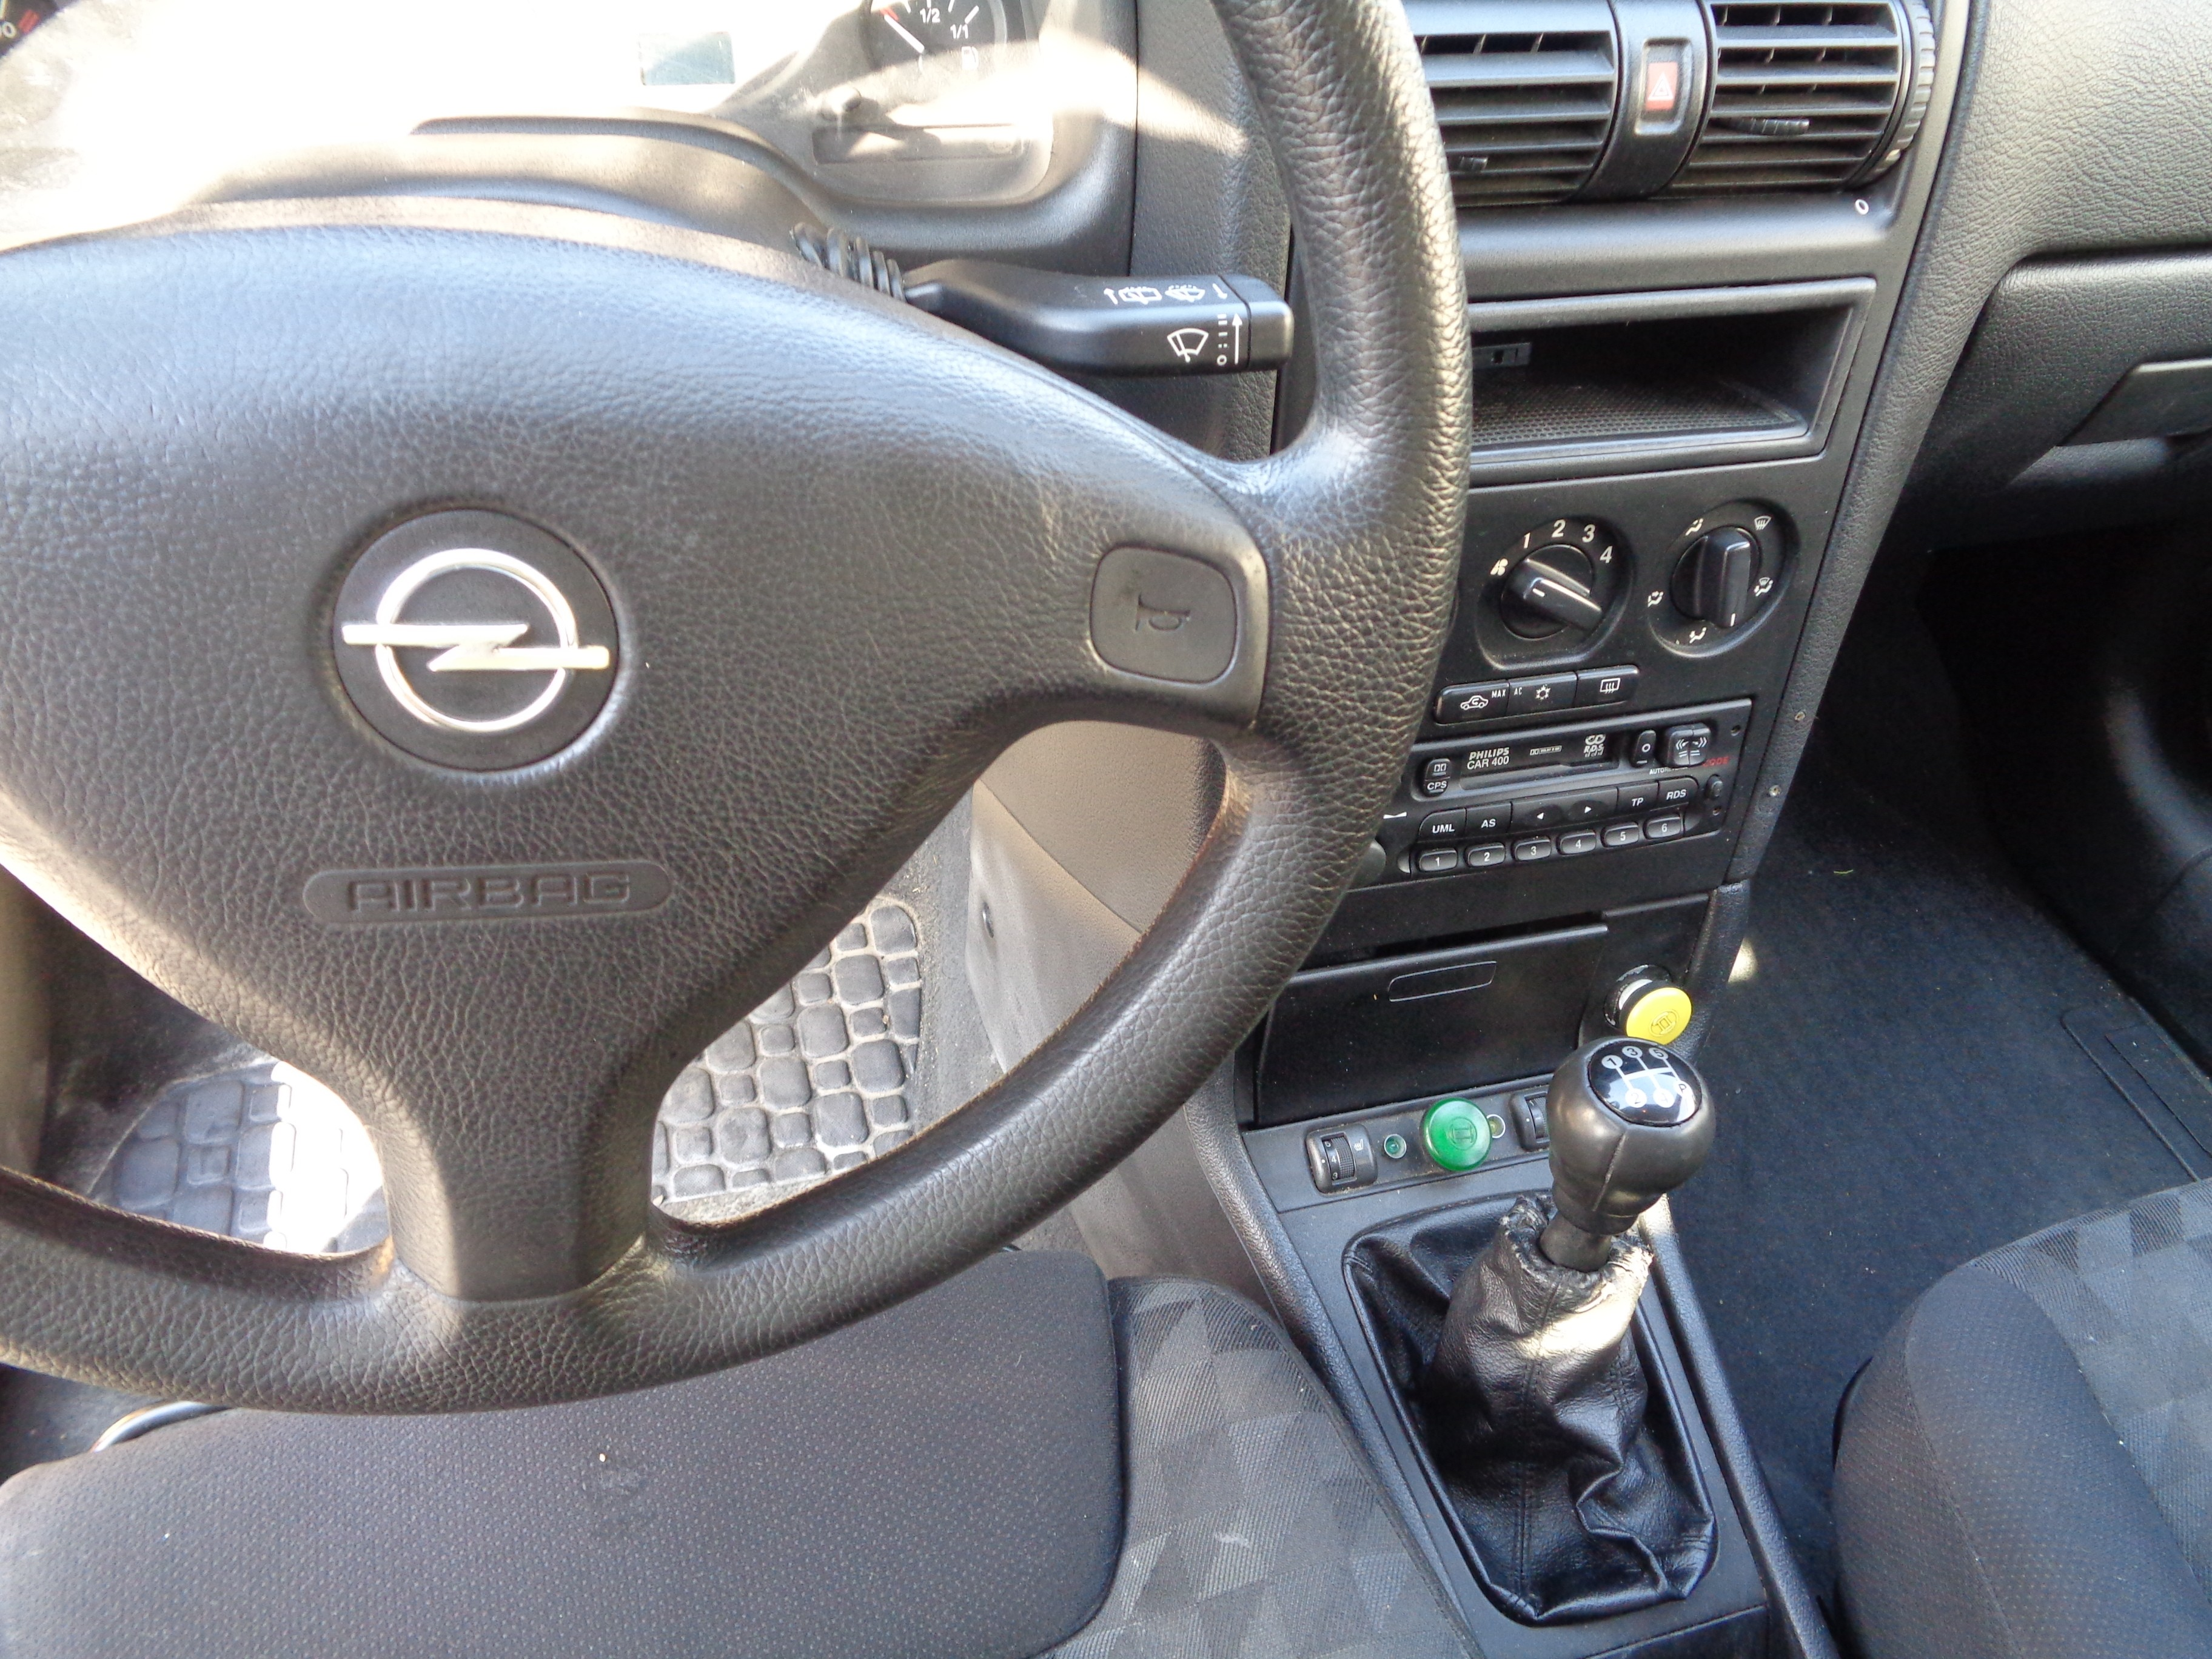 Mecahnic's Car - OPM7X4